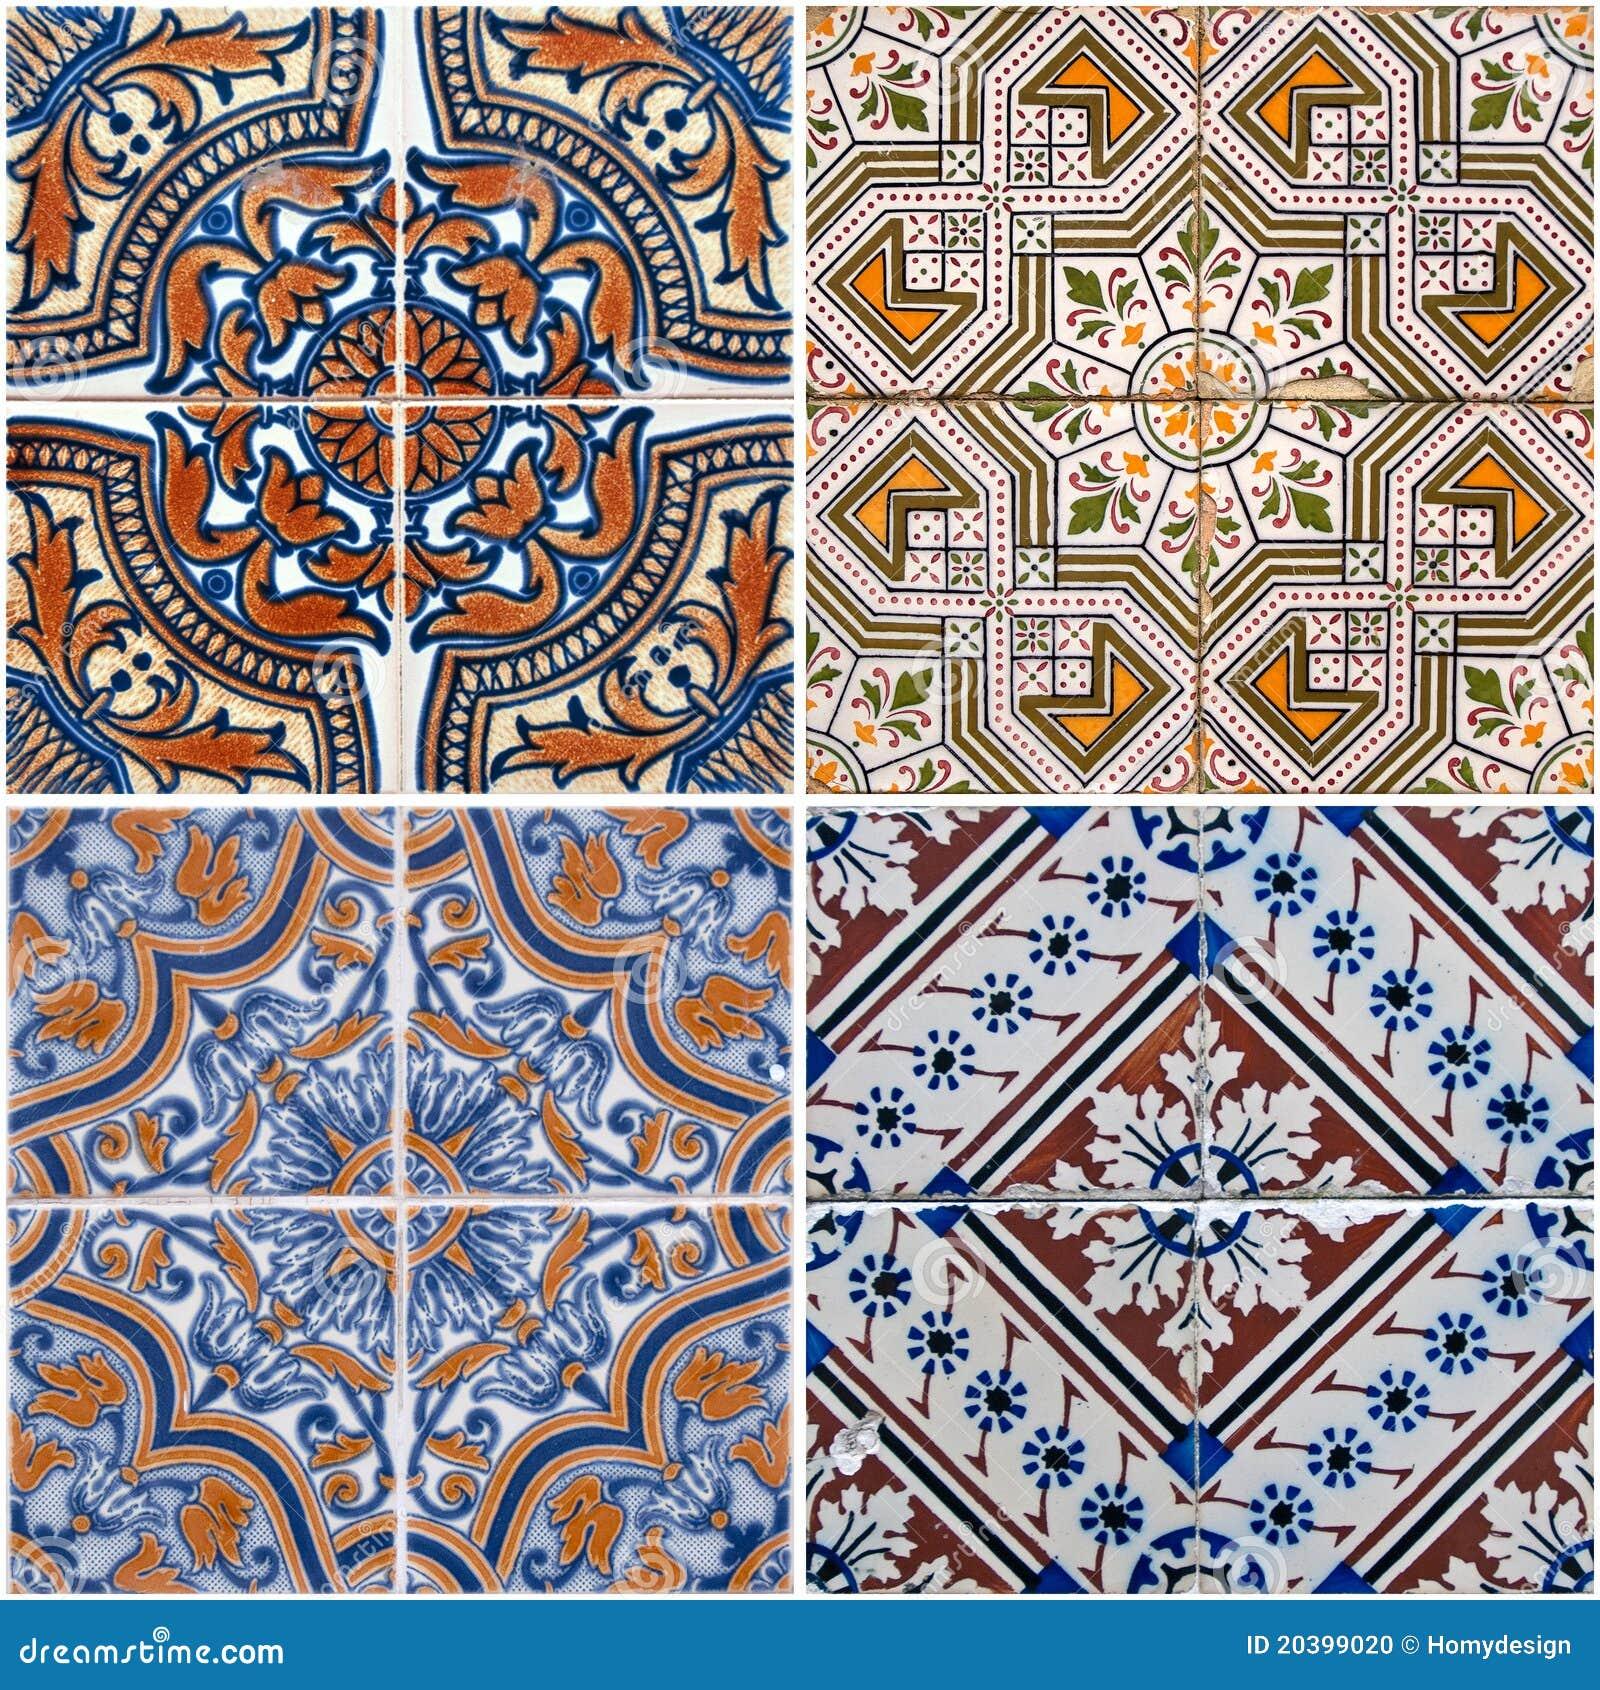 Designer White Abstract Ceramic Wall Tile Pack Of 8 L: Vintage Ceramic Tiles Stock Photo